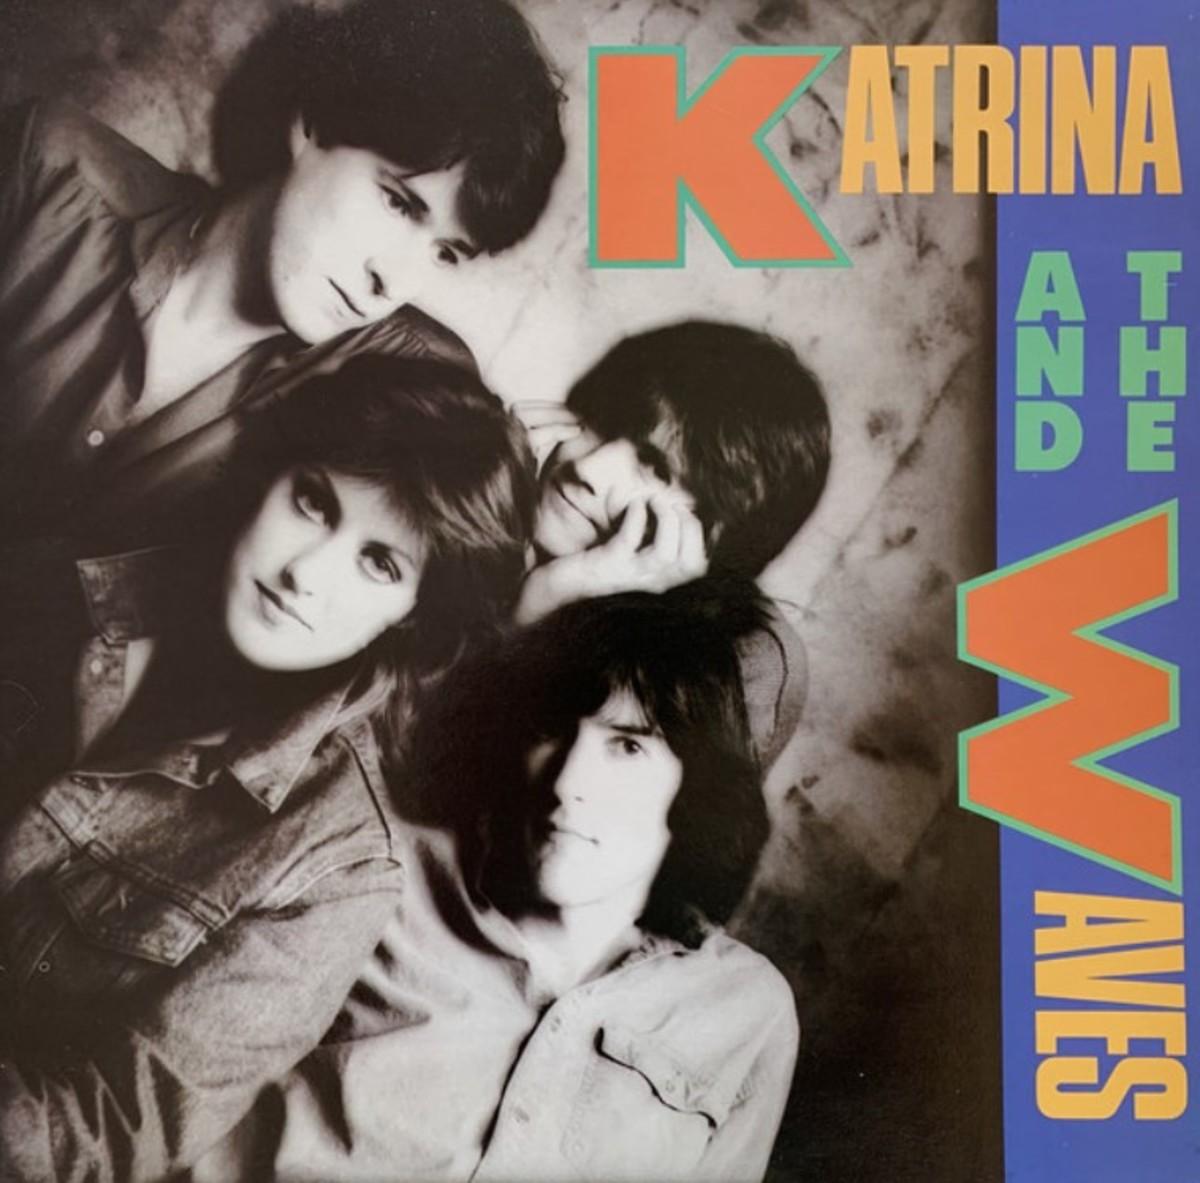 Katrina Waves LP